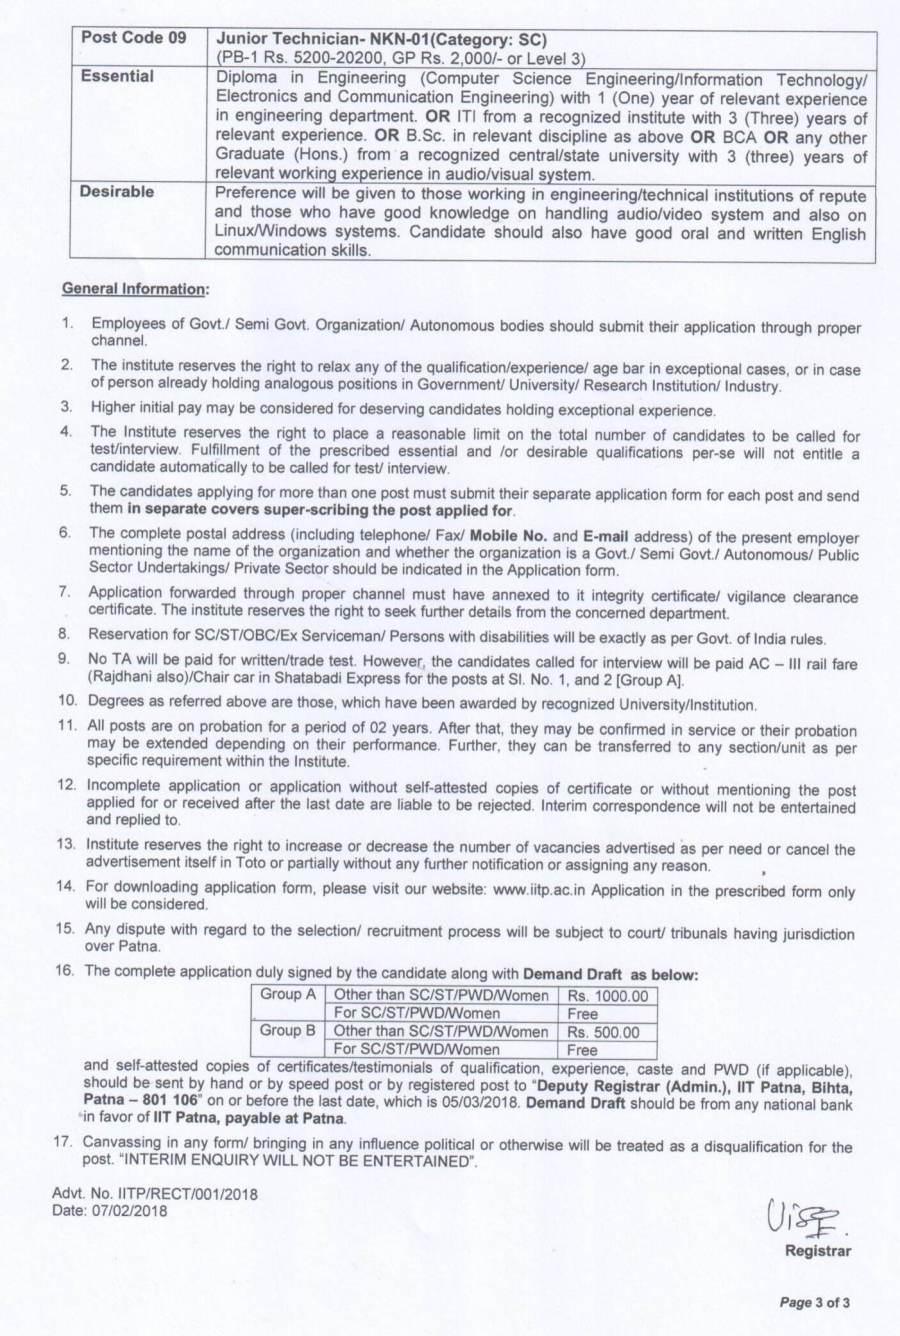 IITP_Recruitment Notice-Feb_2018-3.jpg